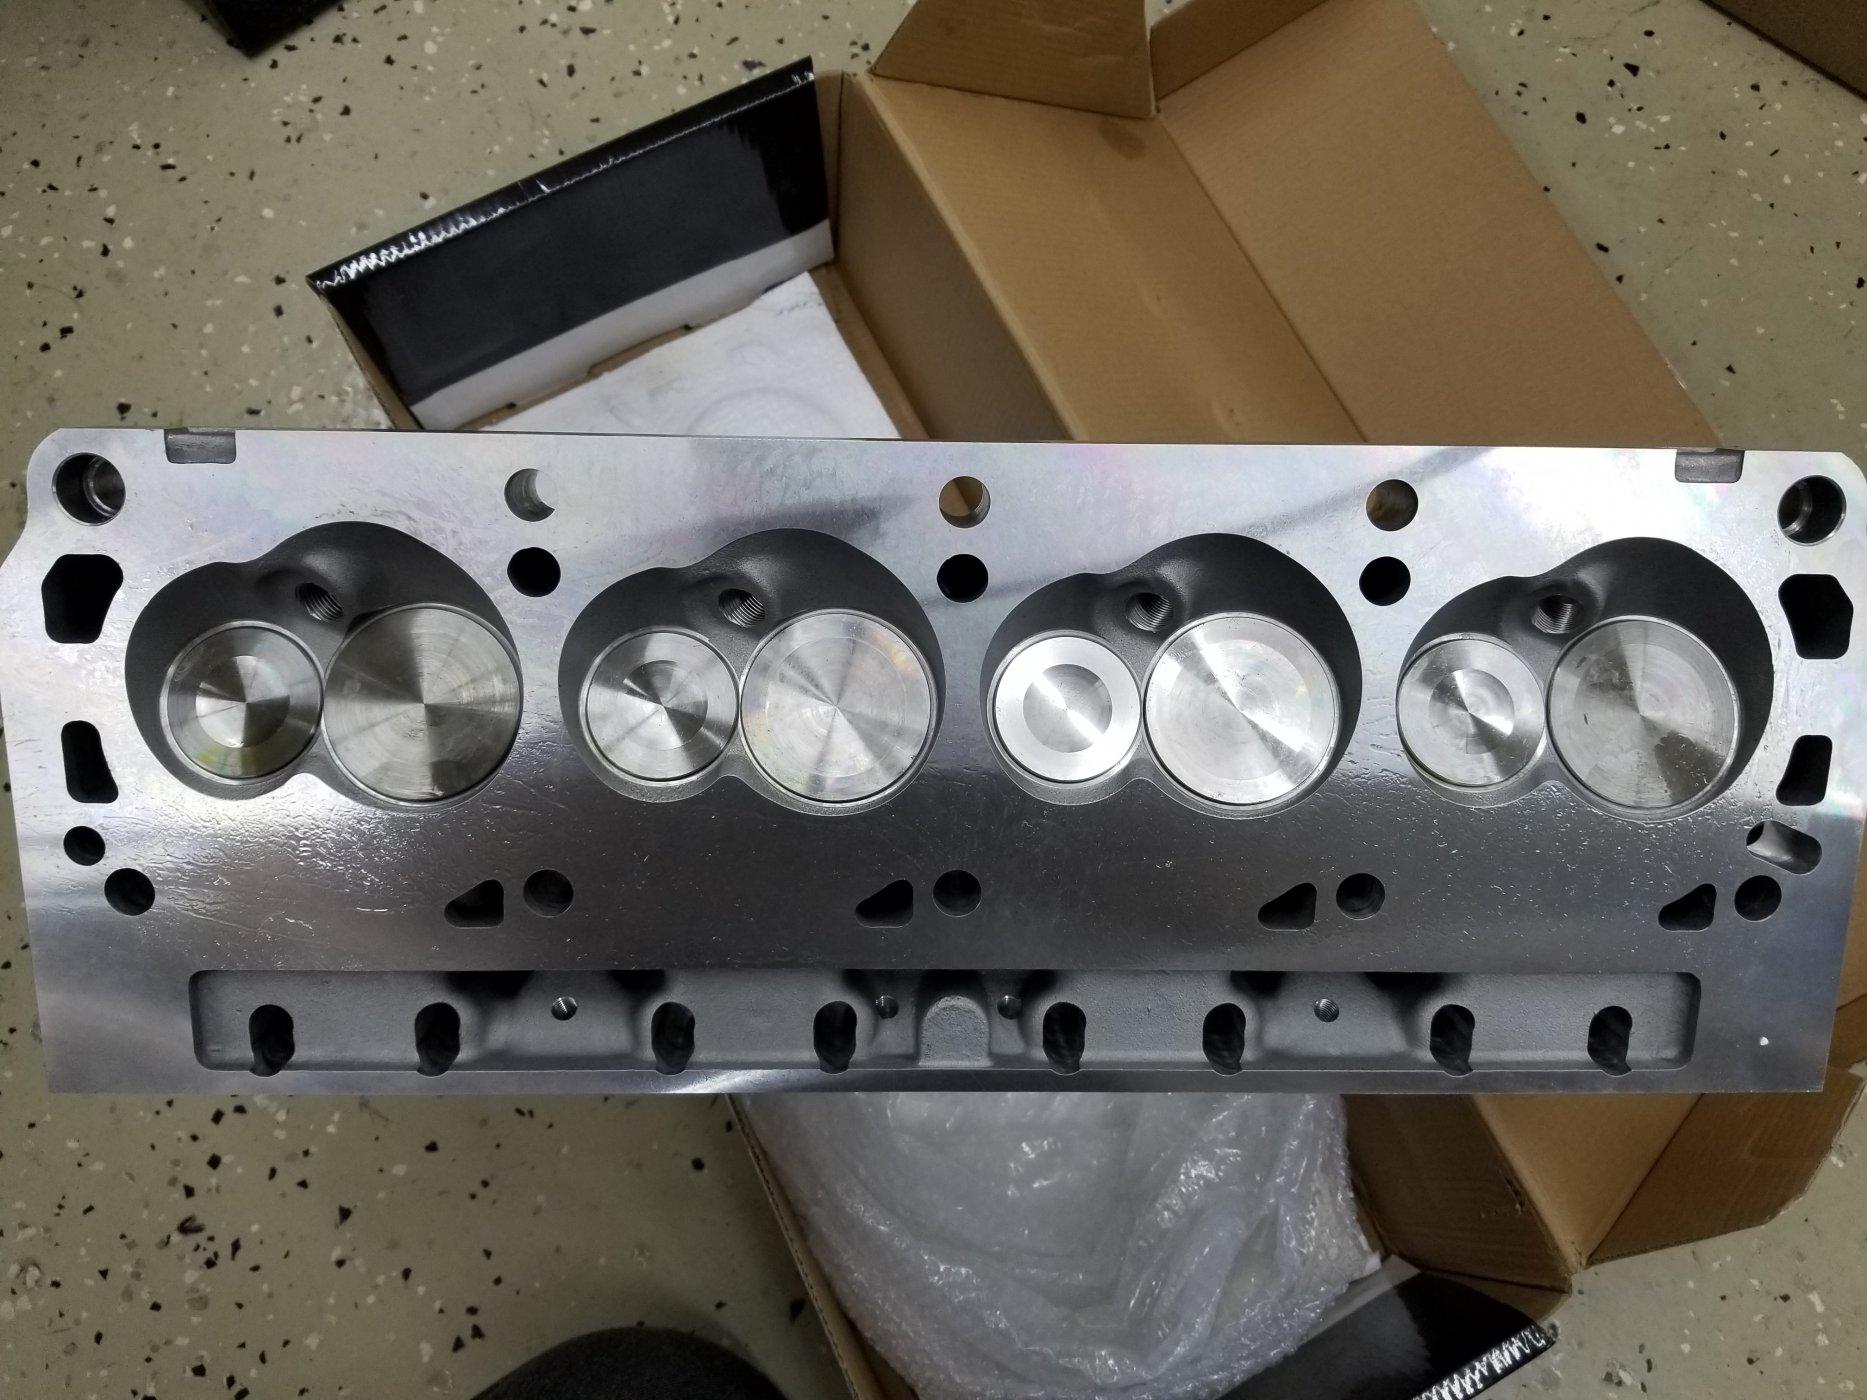 DBB0EC40-F18D-45B1-9FA0-D904368B5CFE.jpeg